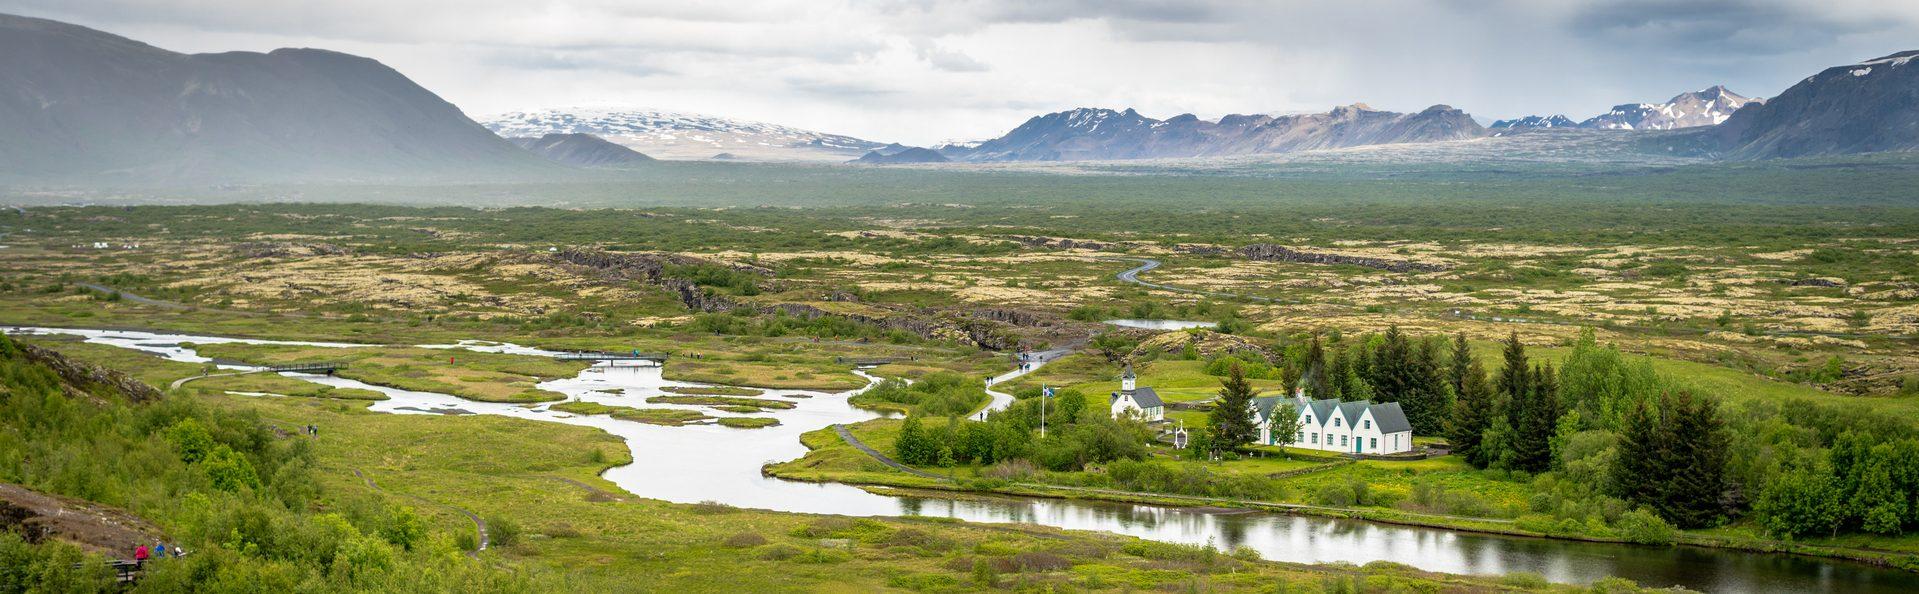 Złoty Krąg (eng. Golden Circle) – czyli Islandia w Pigułce.